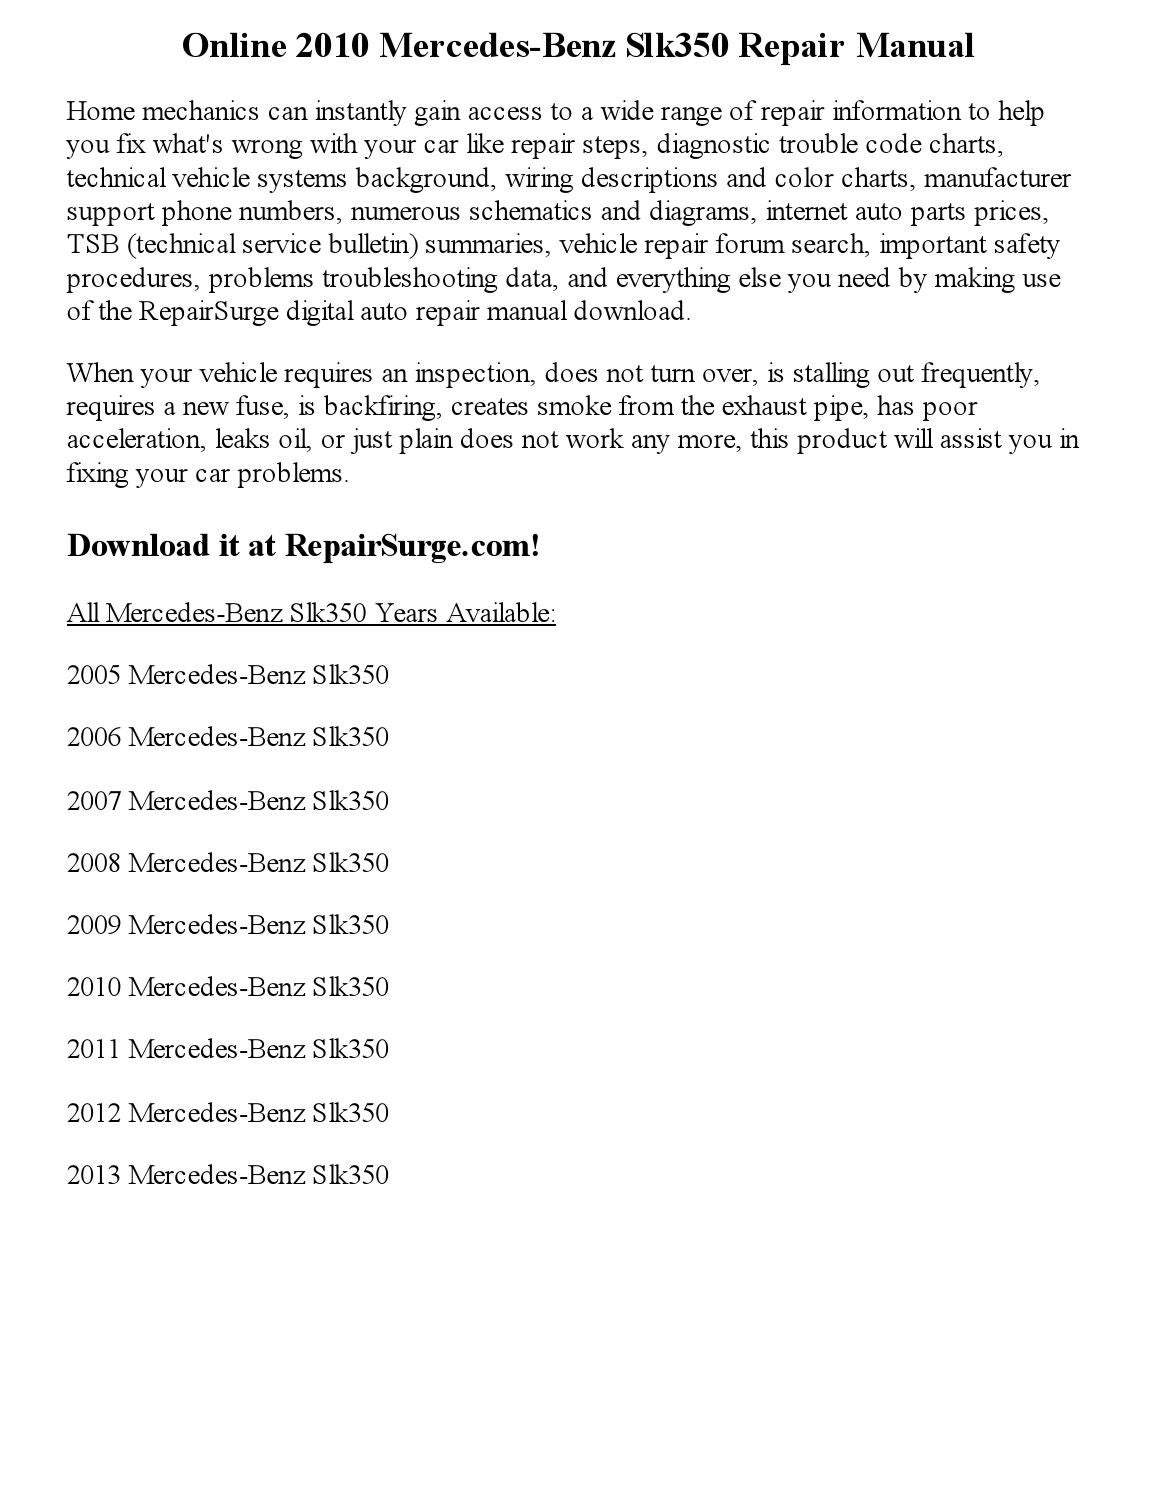 hight resolution of 2010 mercedes benz slk350 repair manual online